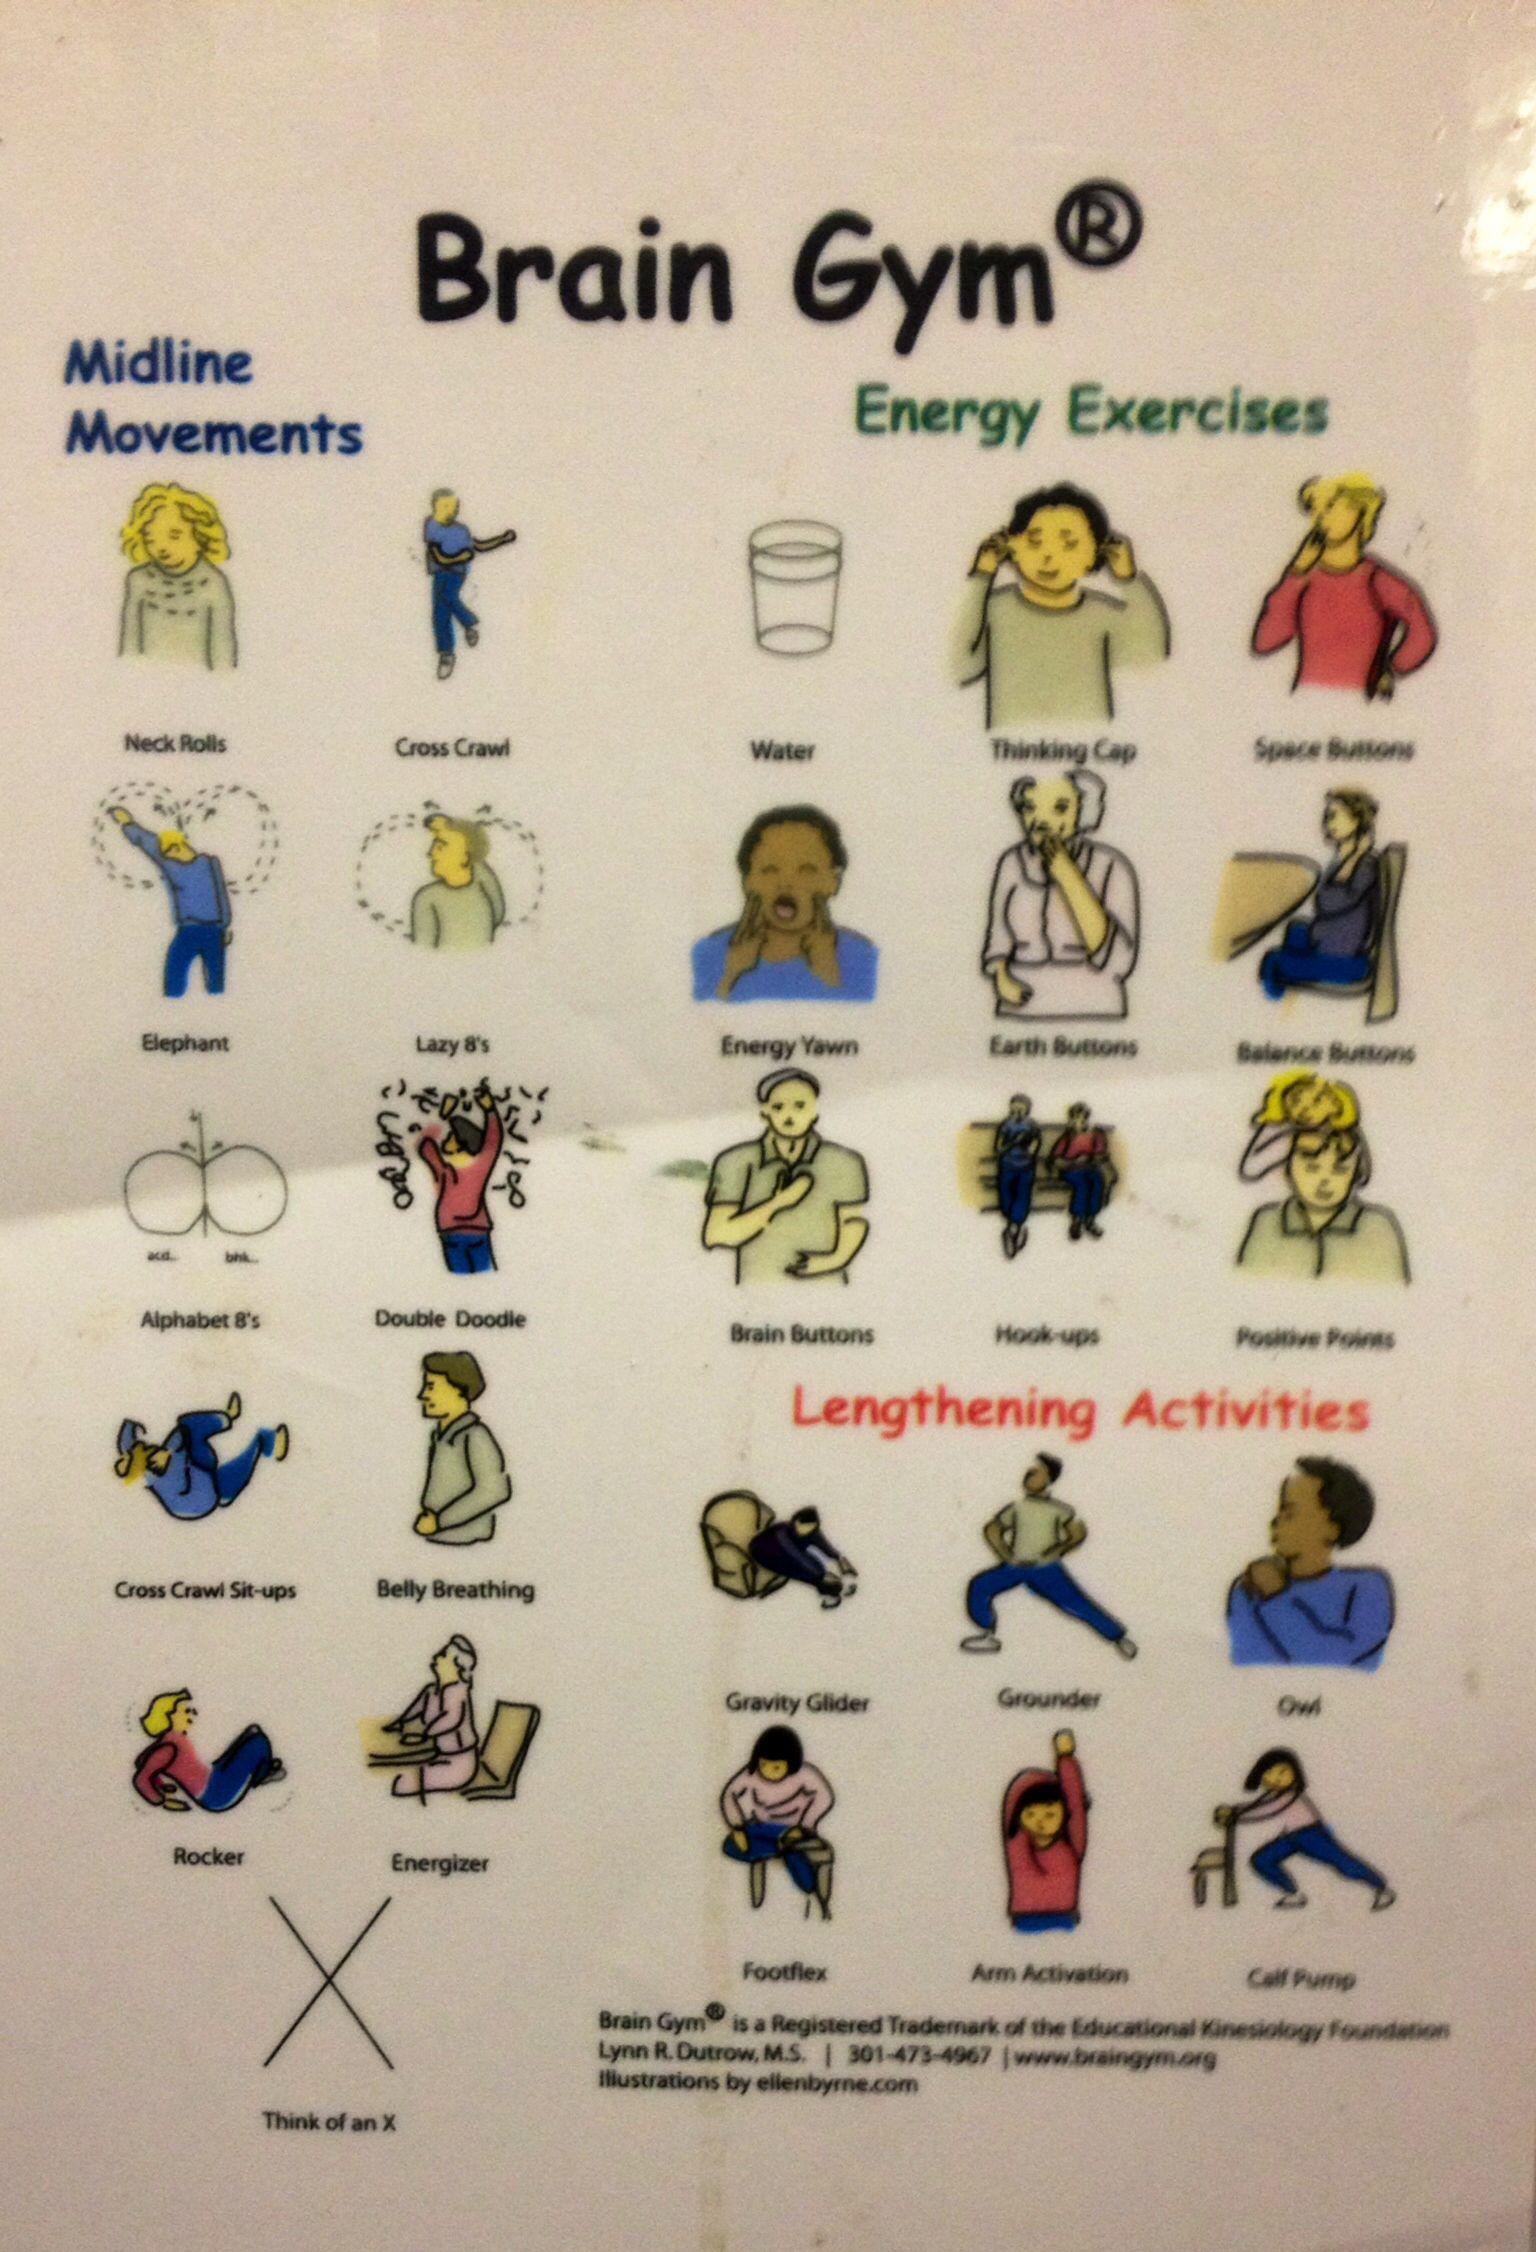 Brain Gym (With images) Brain gym, Brain gym exercises